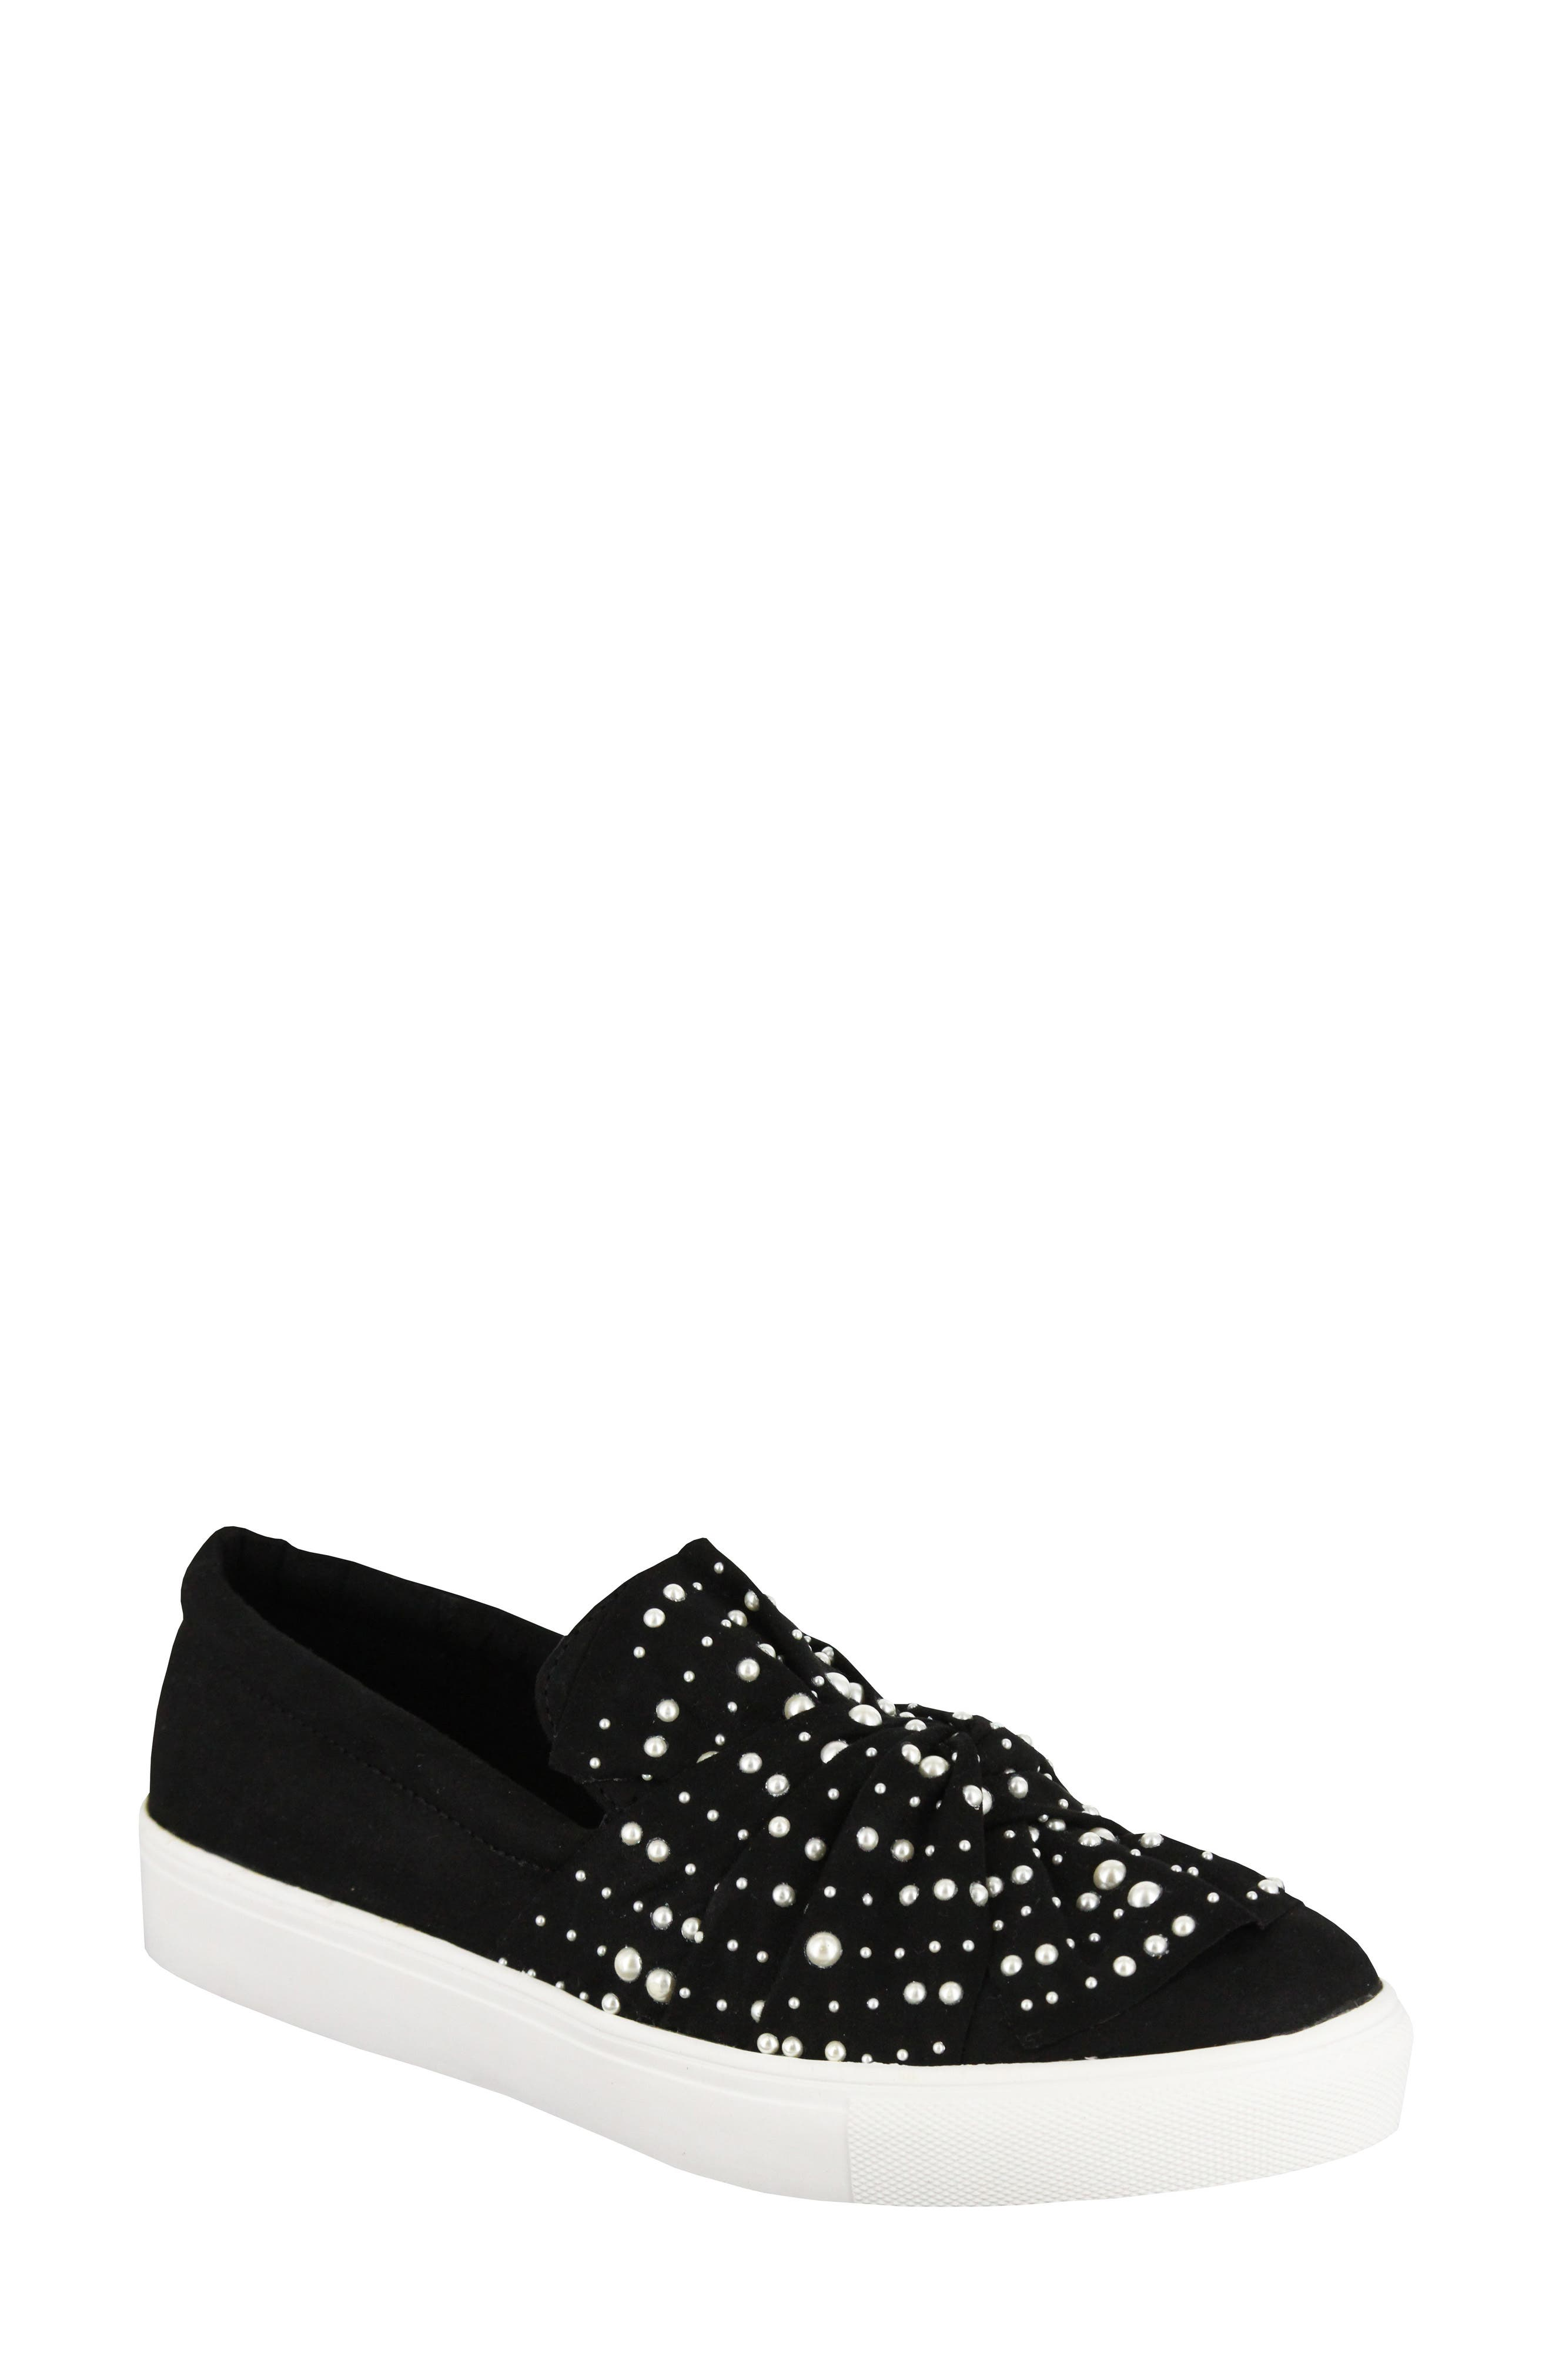 Aretha Embellished Slip-On Sneaker,                             Main thumbnail 1, color,